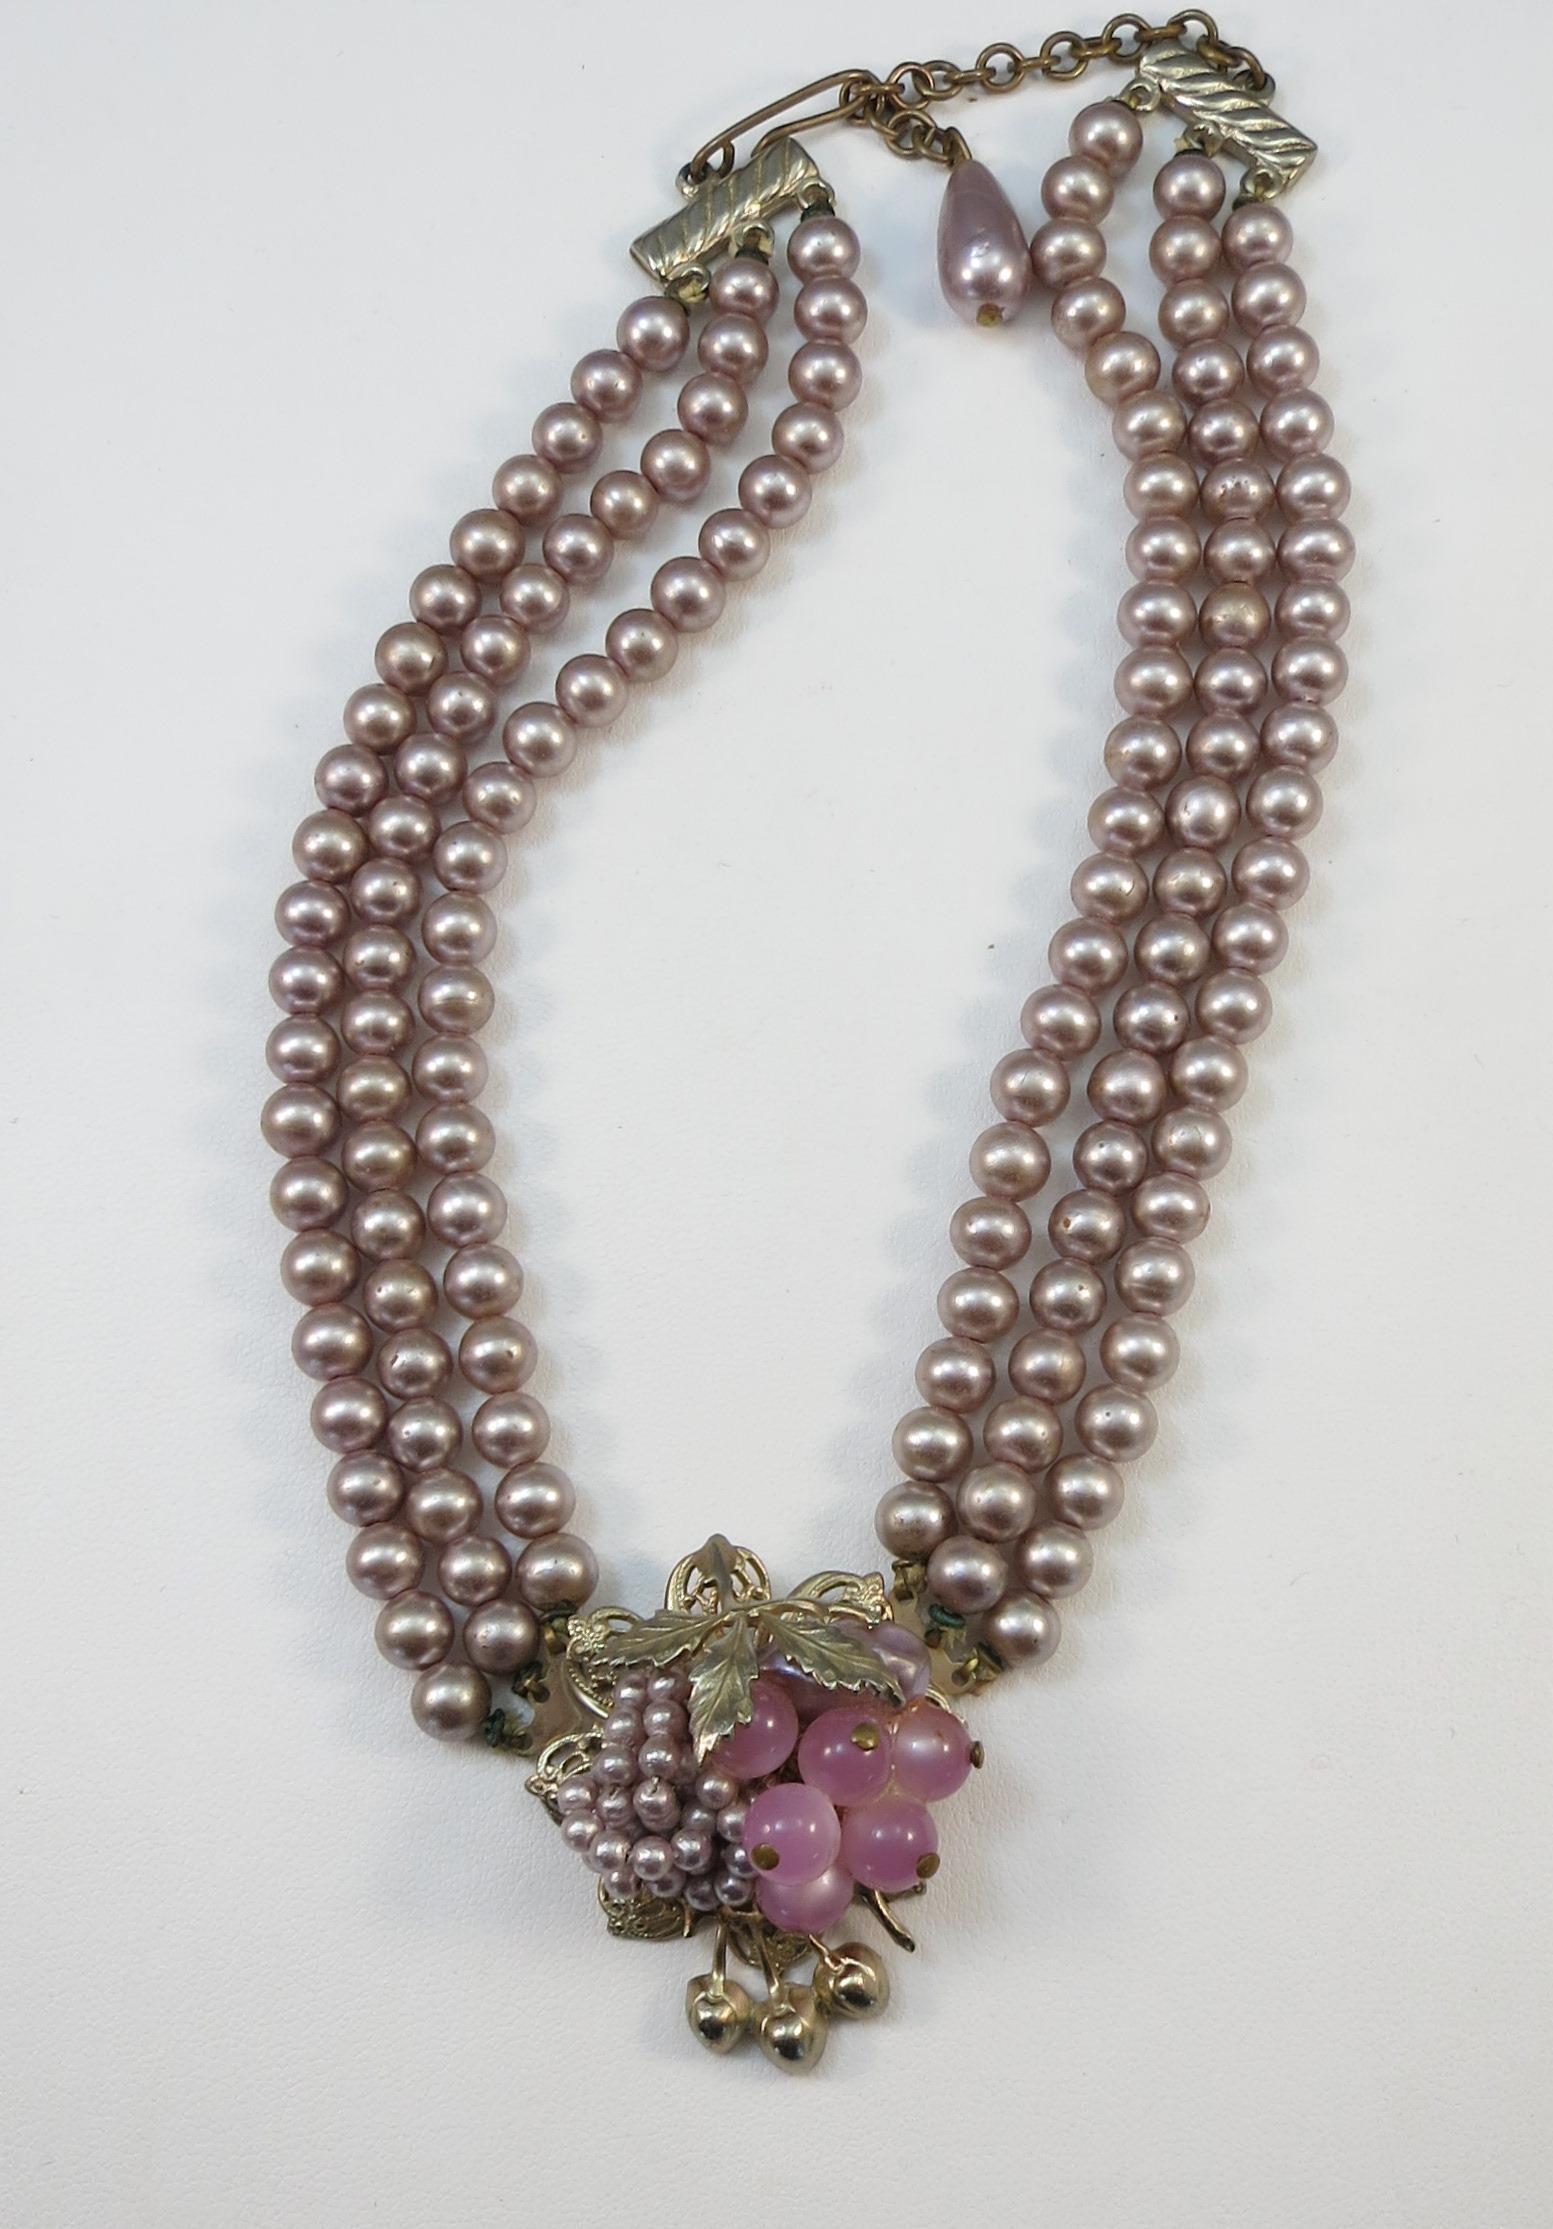 VINTAGE Three Strand Pinkish Pearl-like Choker with Pink Glass Beads